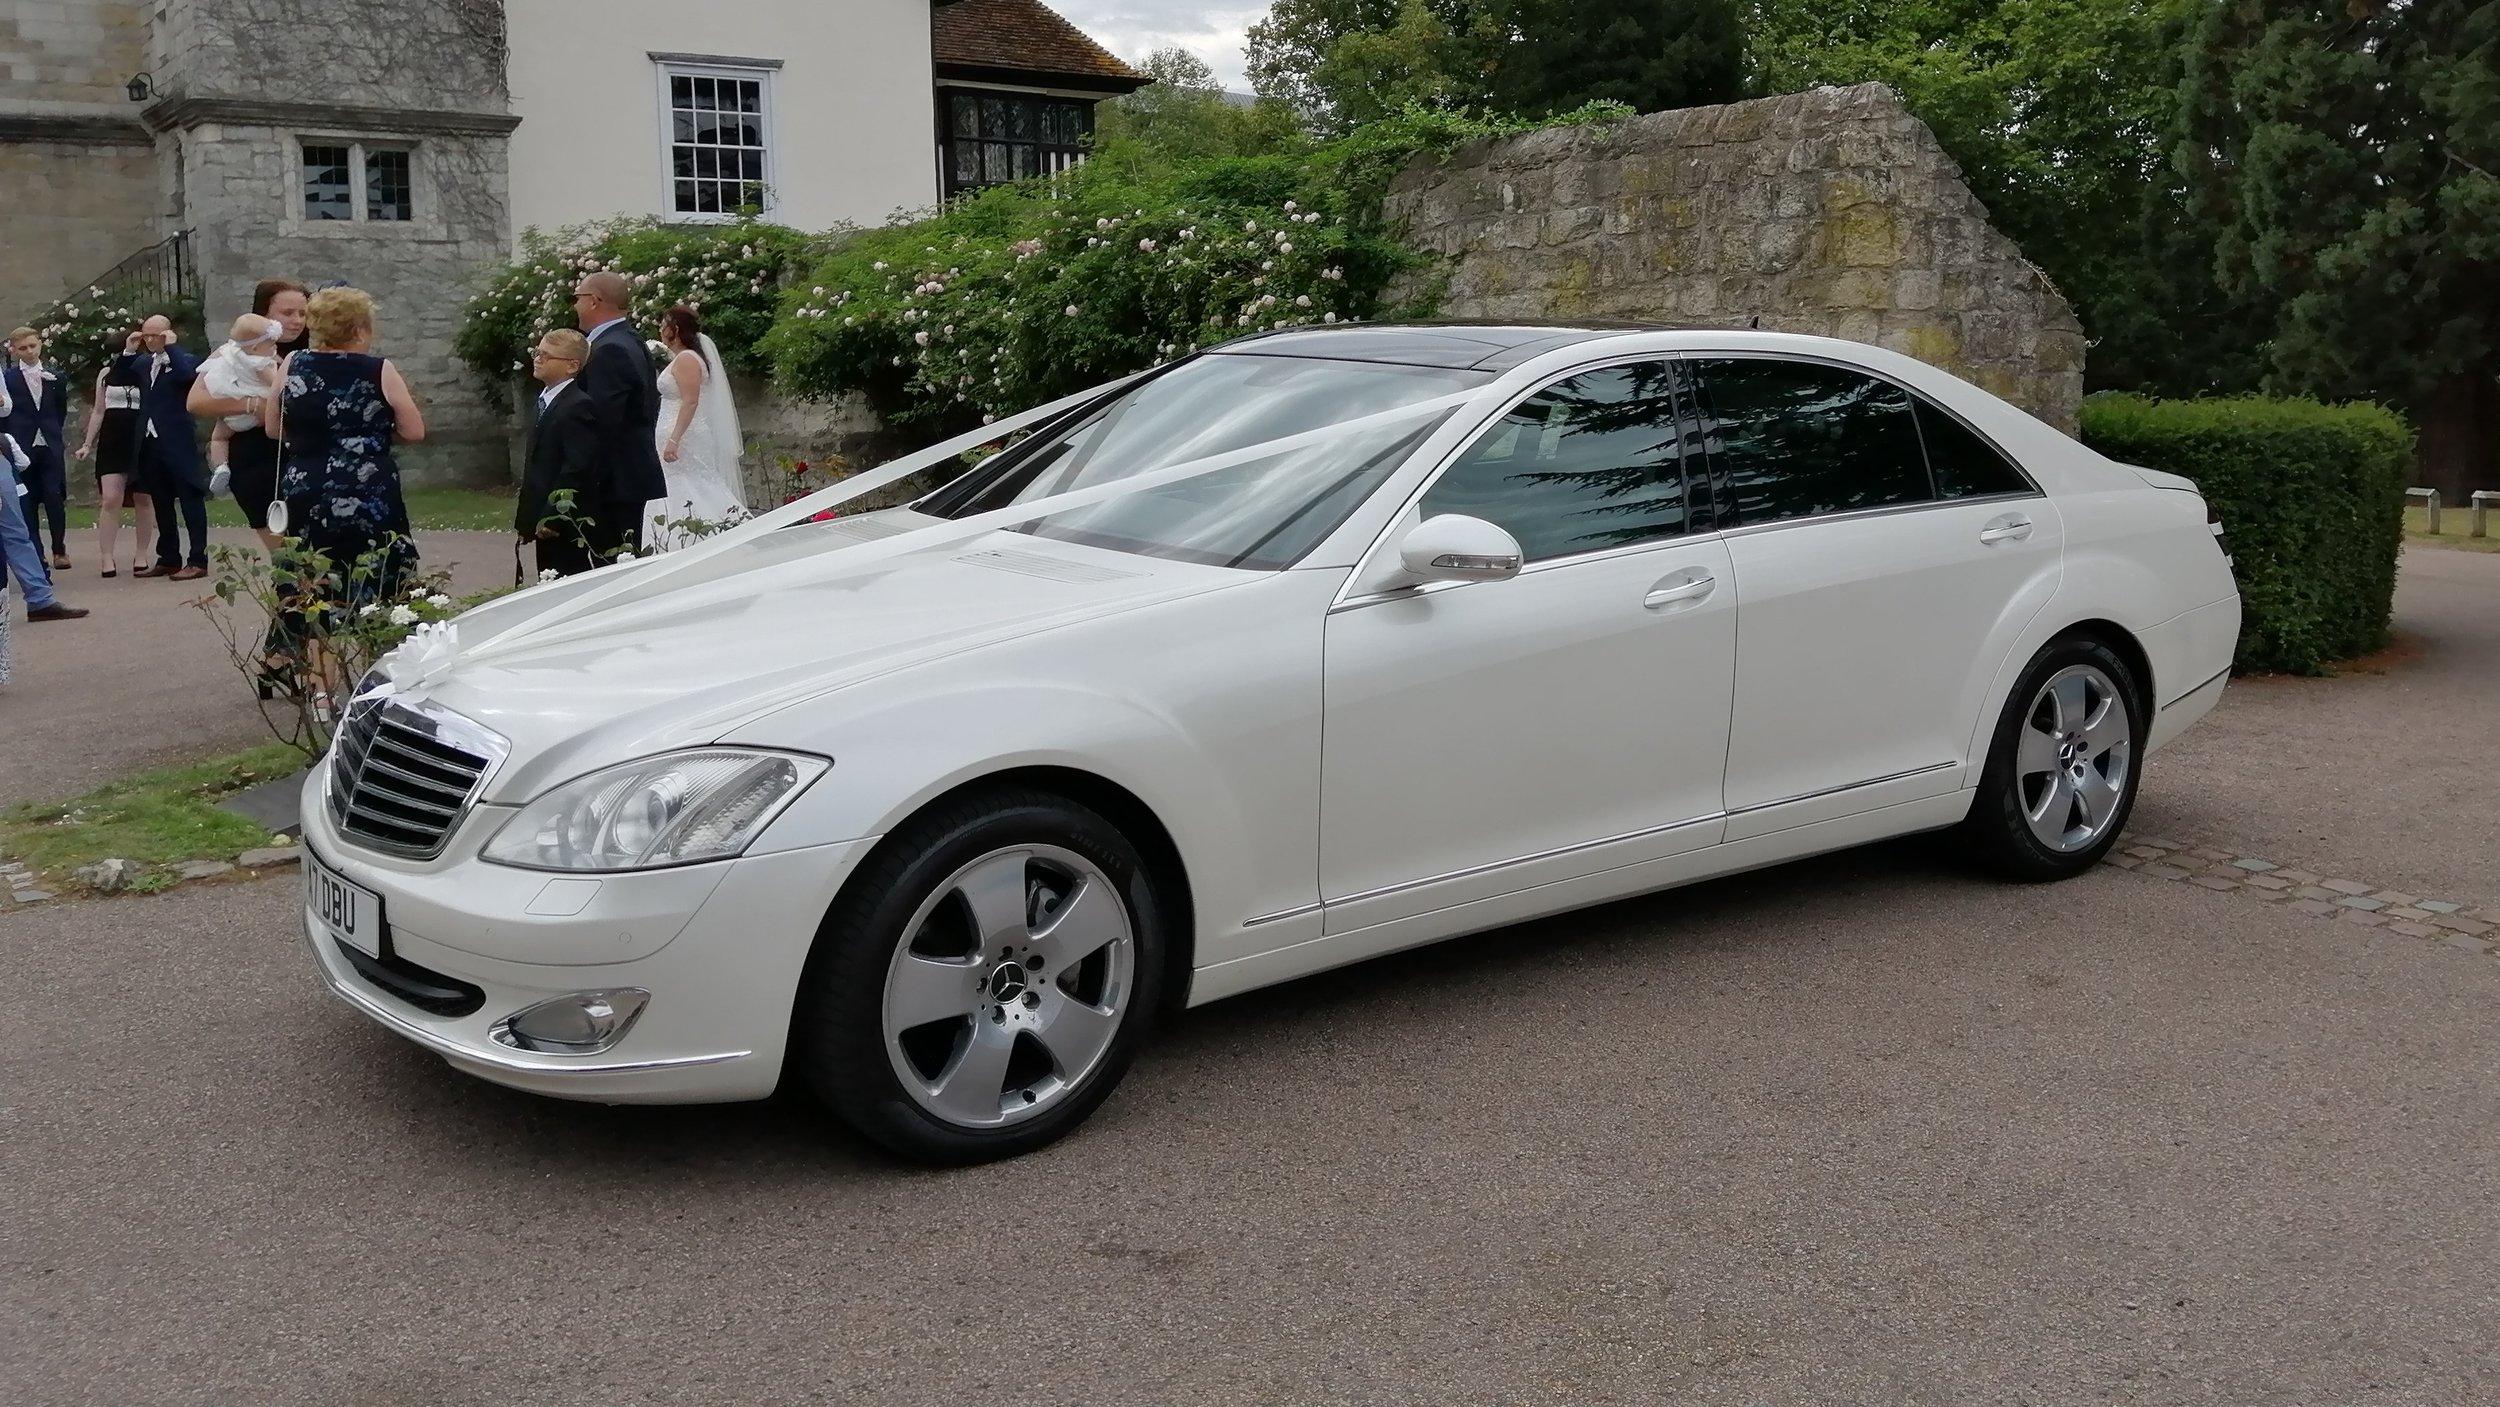 Kent Medway Wedding Cars